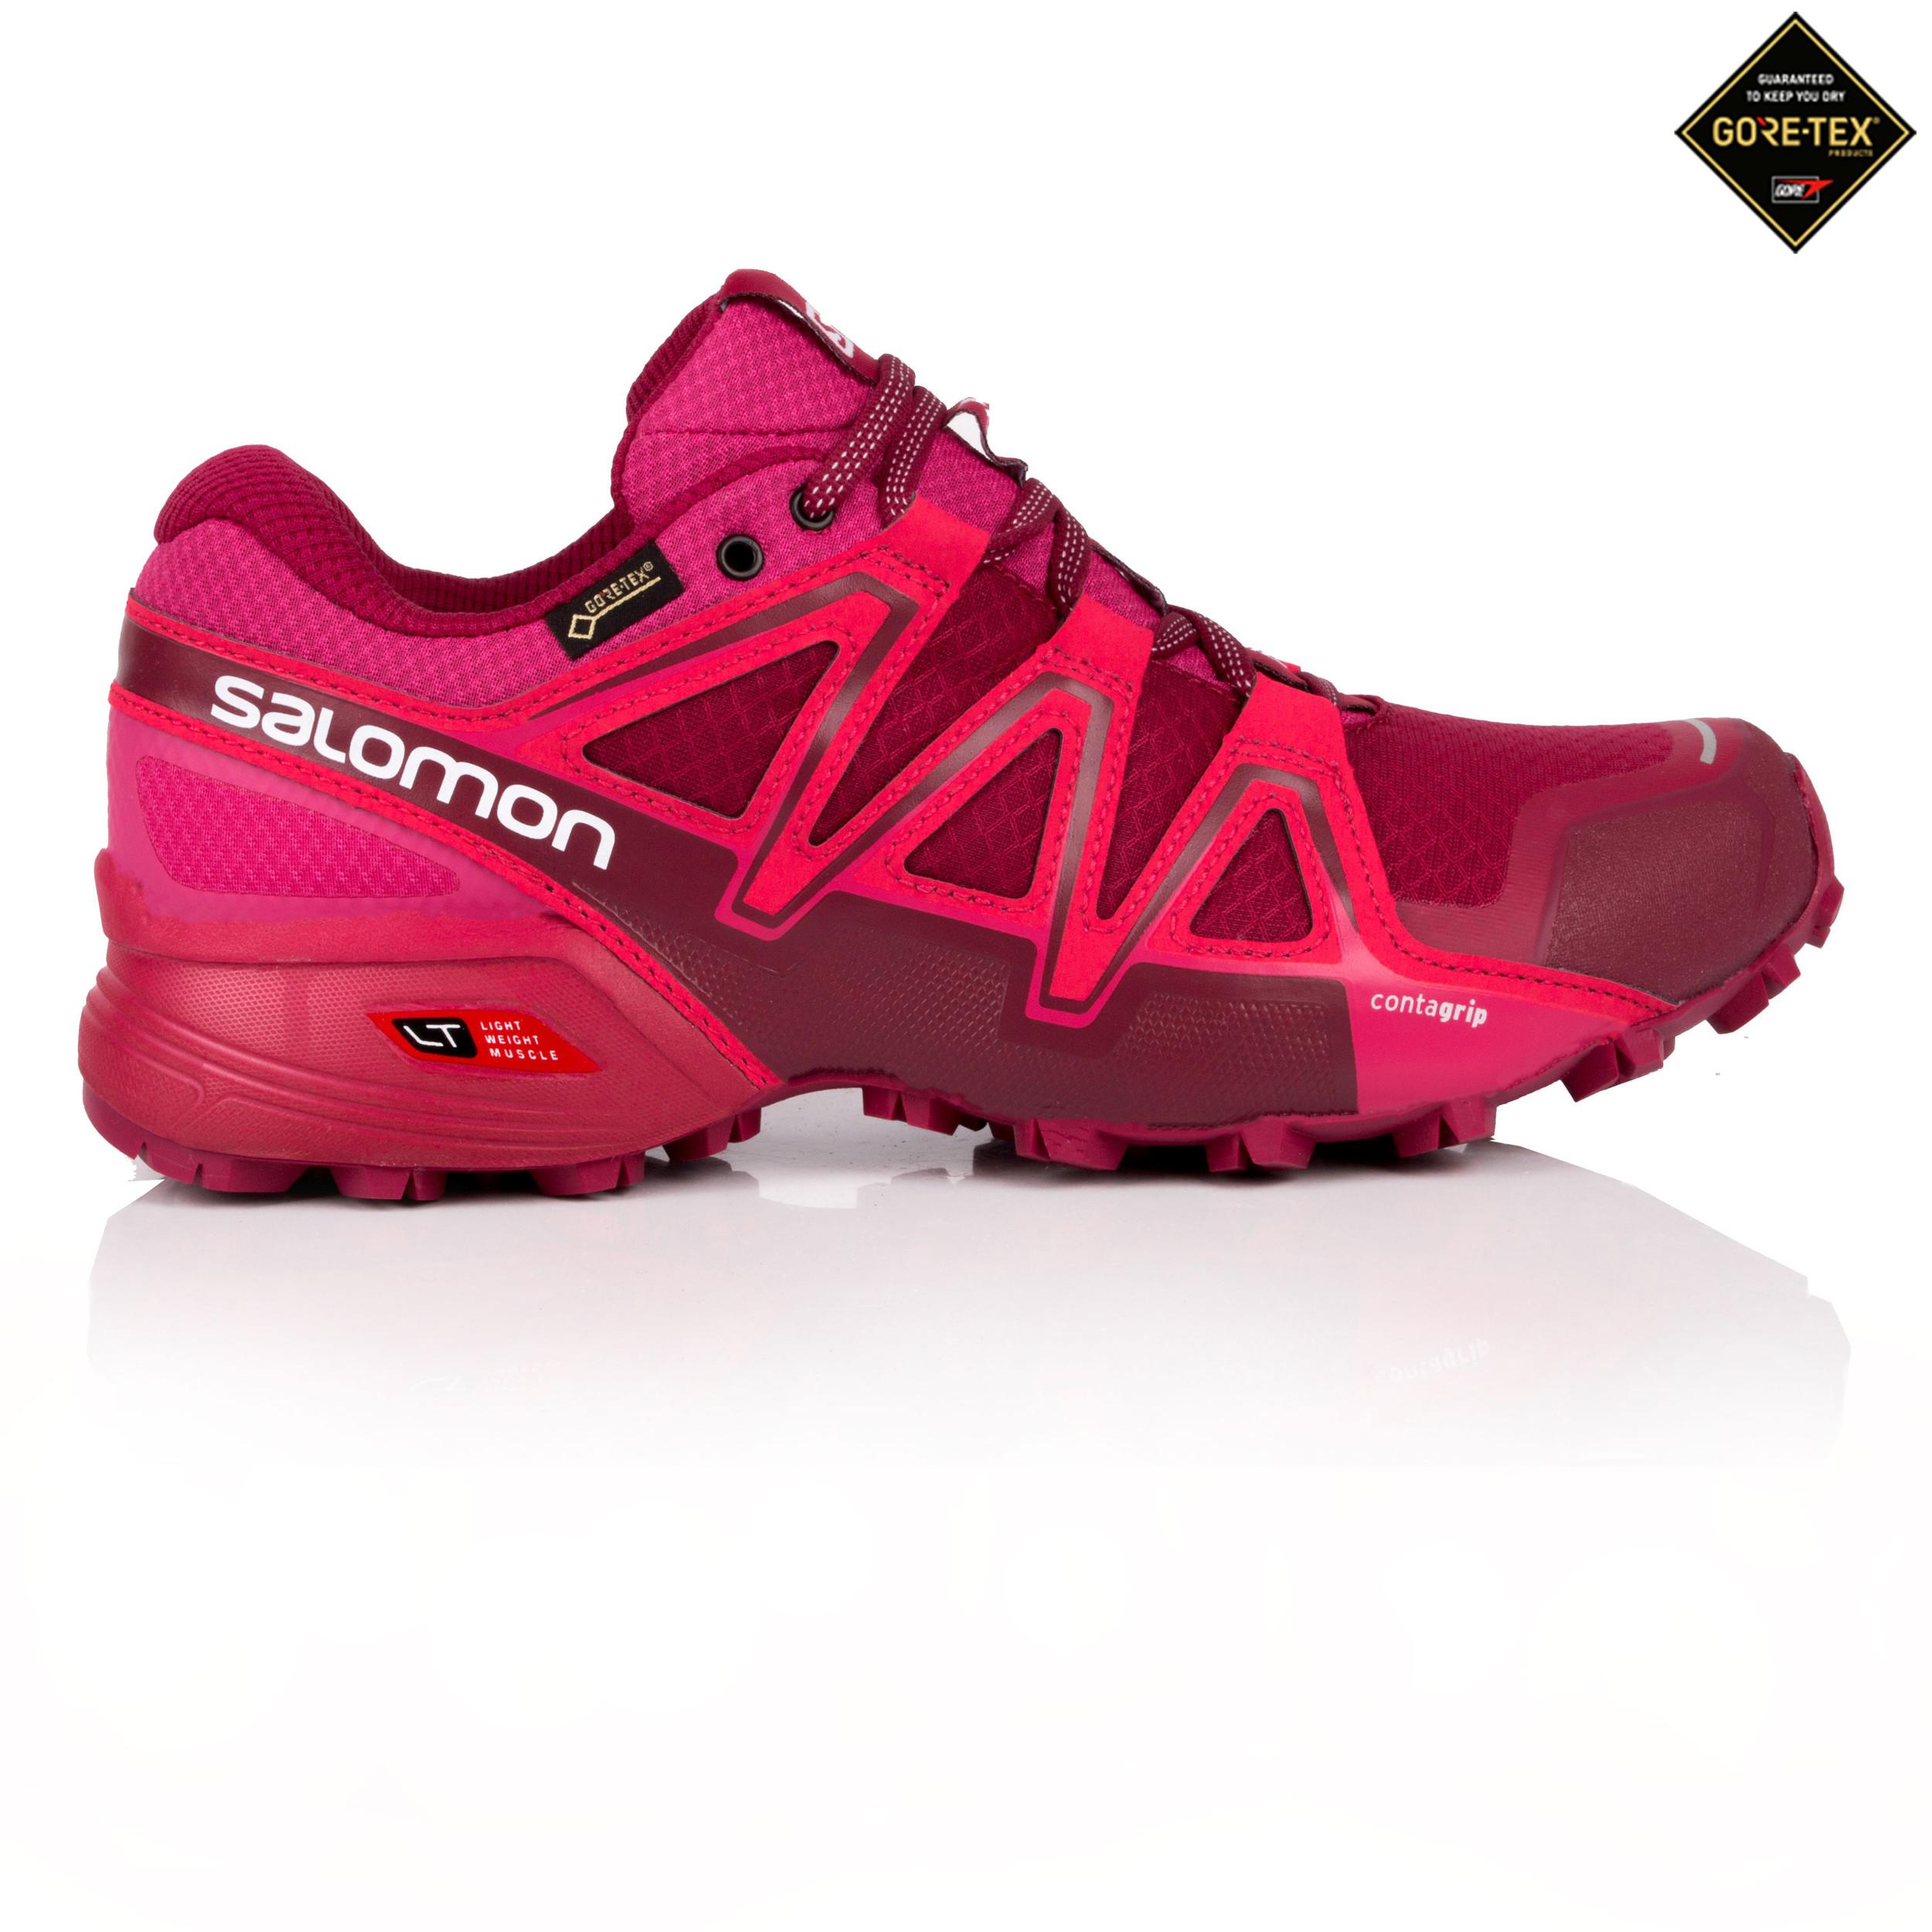 Salomon Donna Speedcross Vario 2 Gore Tex Trail Scarpe Da Corsa Ginnastica  Viola aebfbecf9cc